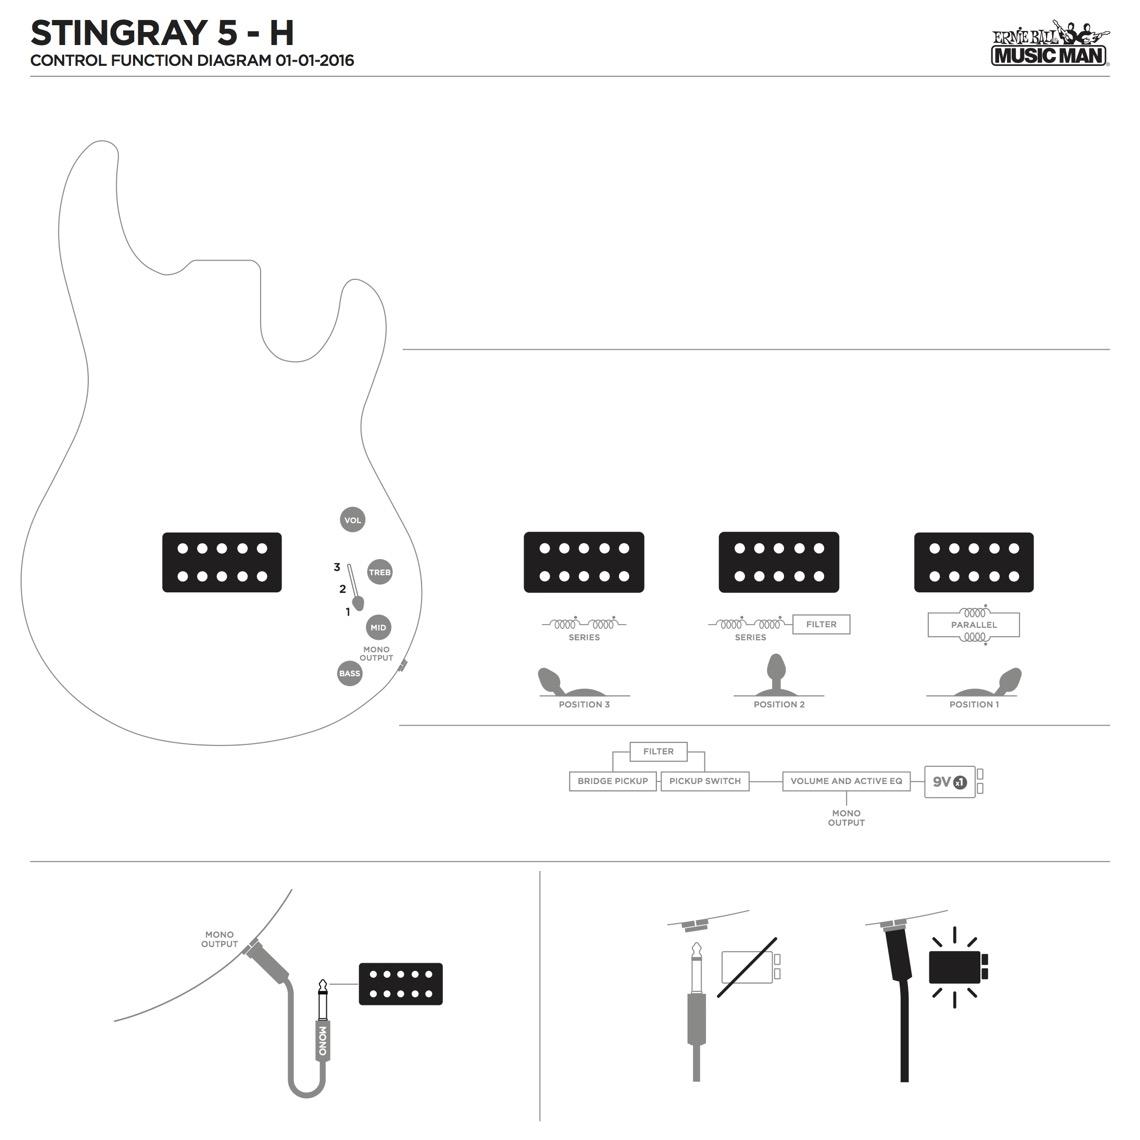 Stingray 5